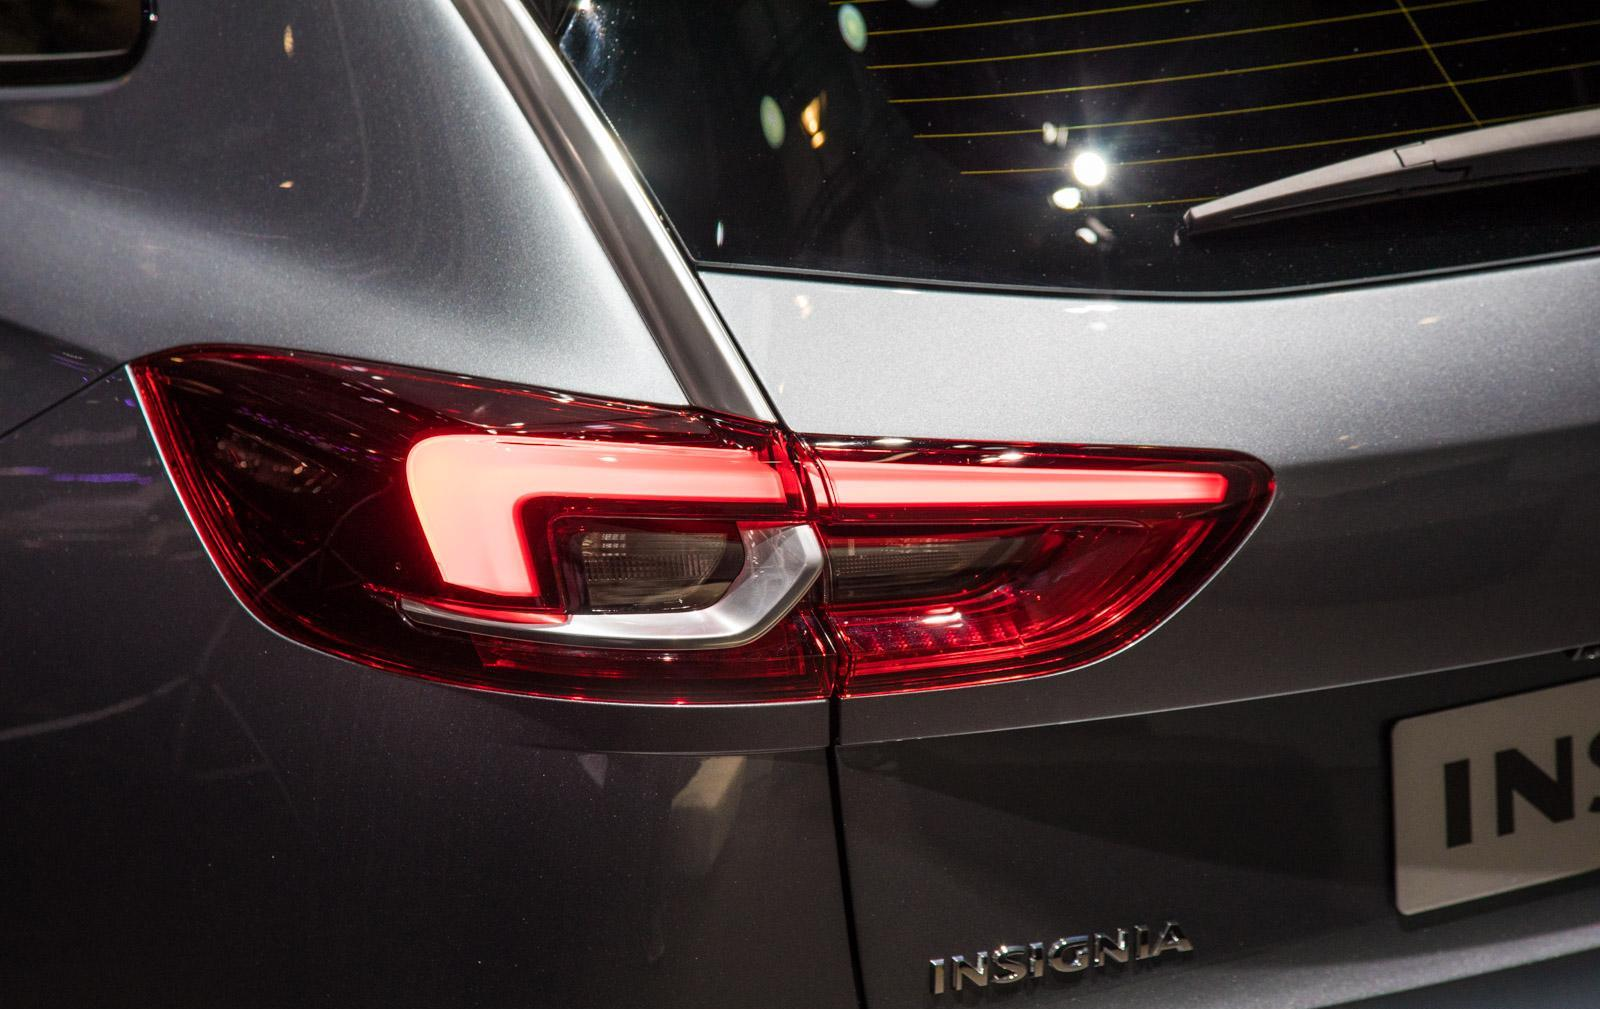 Opel-insignia-005